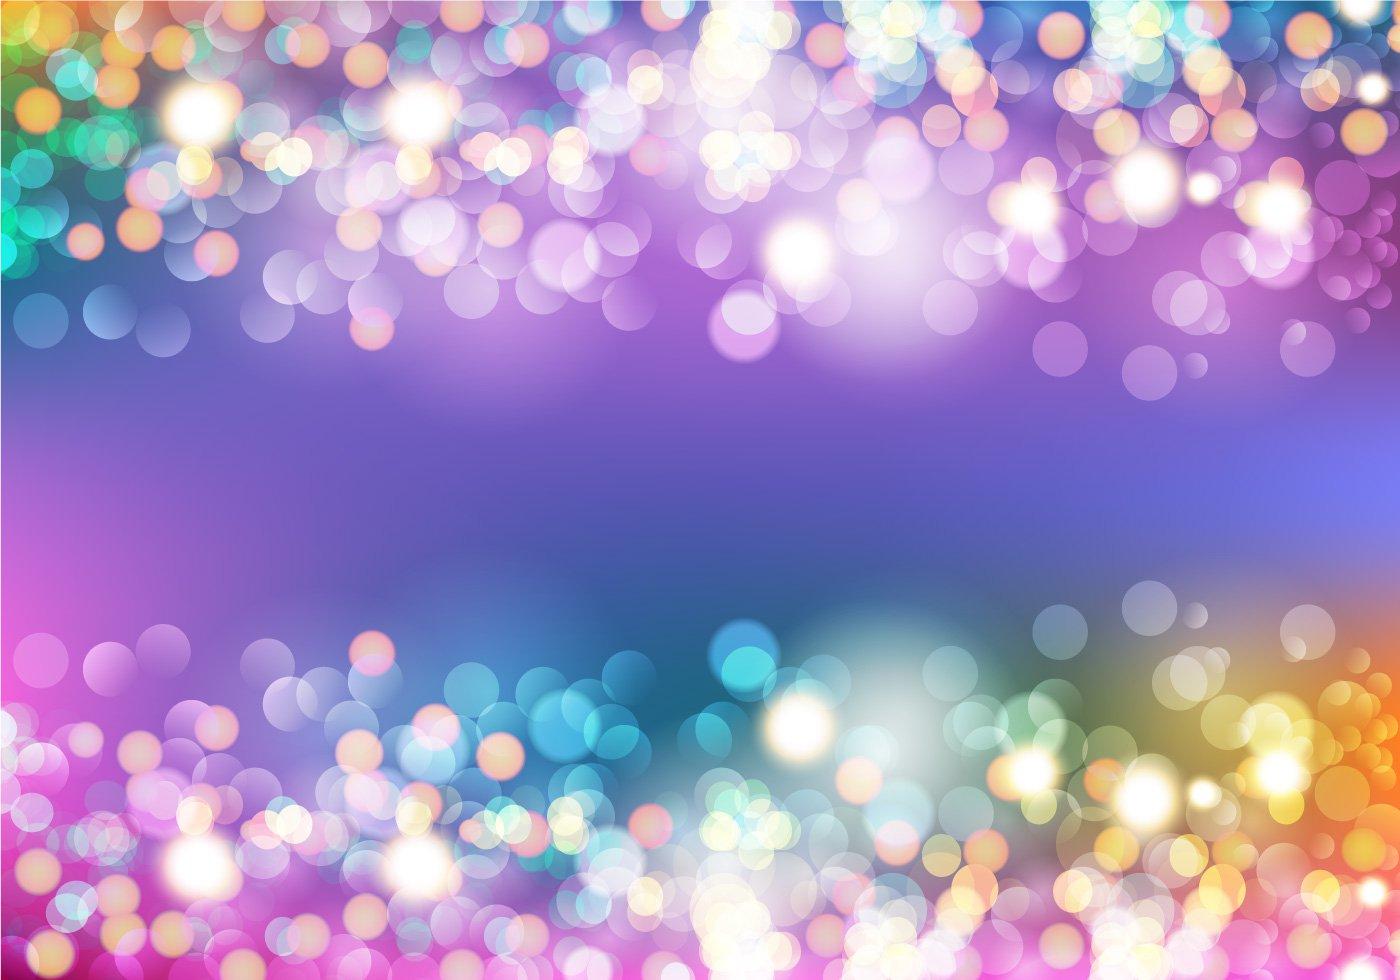 hd celebration background 30 Purple Toad Social Tap 1400x980